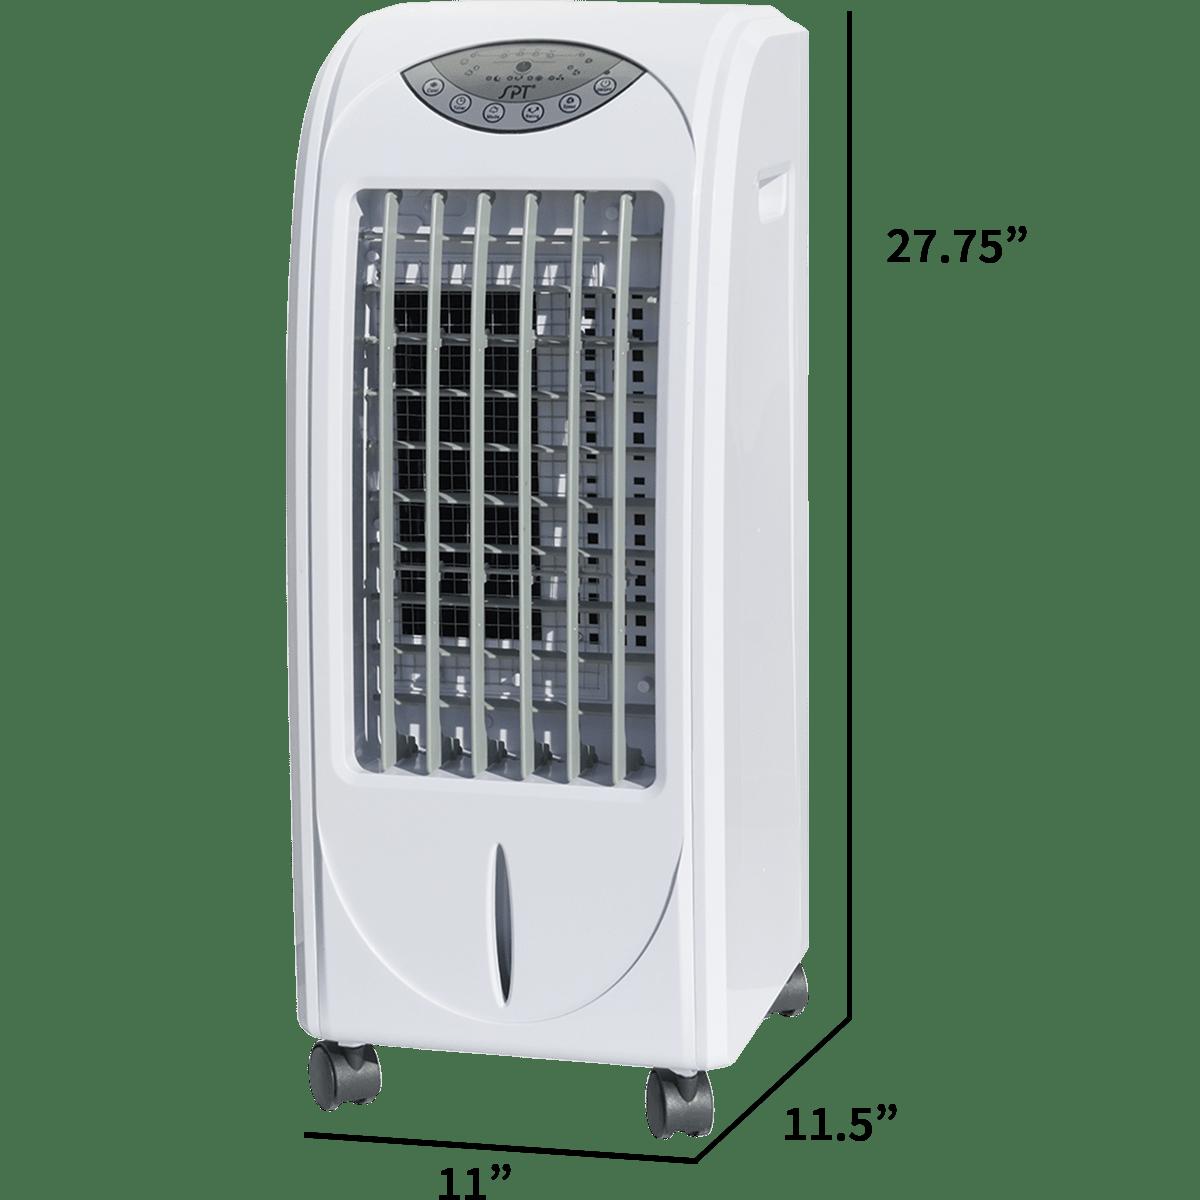 Sunpentown Sf 614p Evaporative Cooler Sylvane